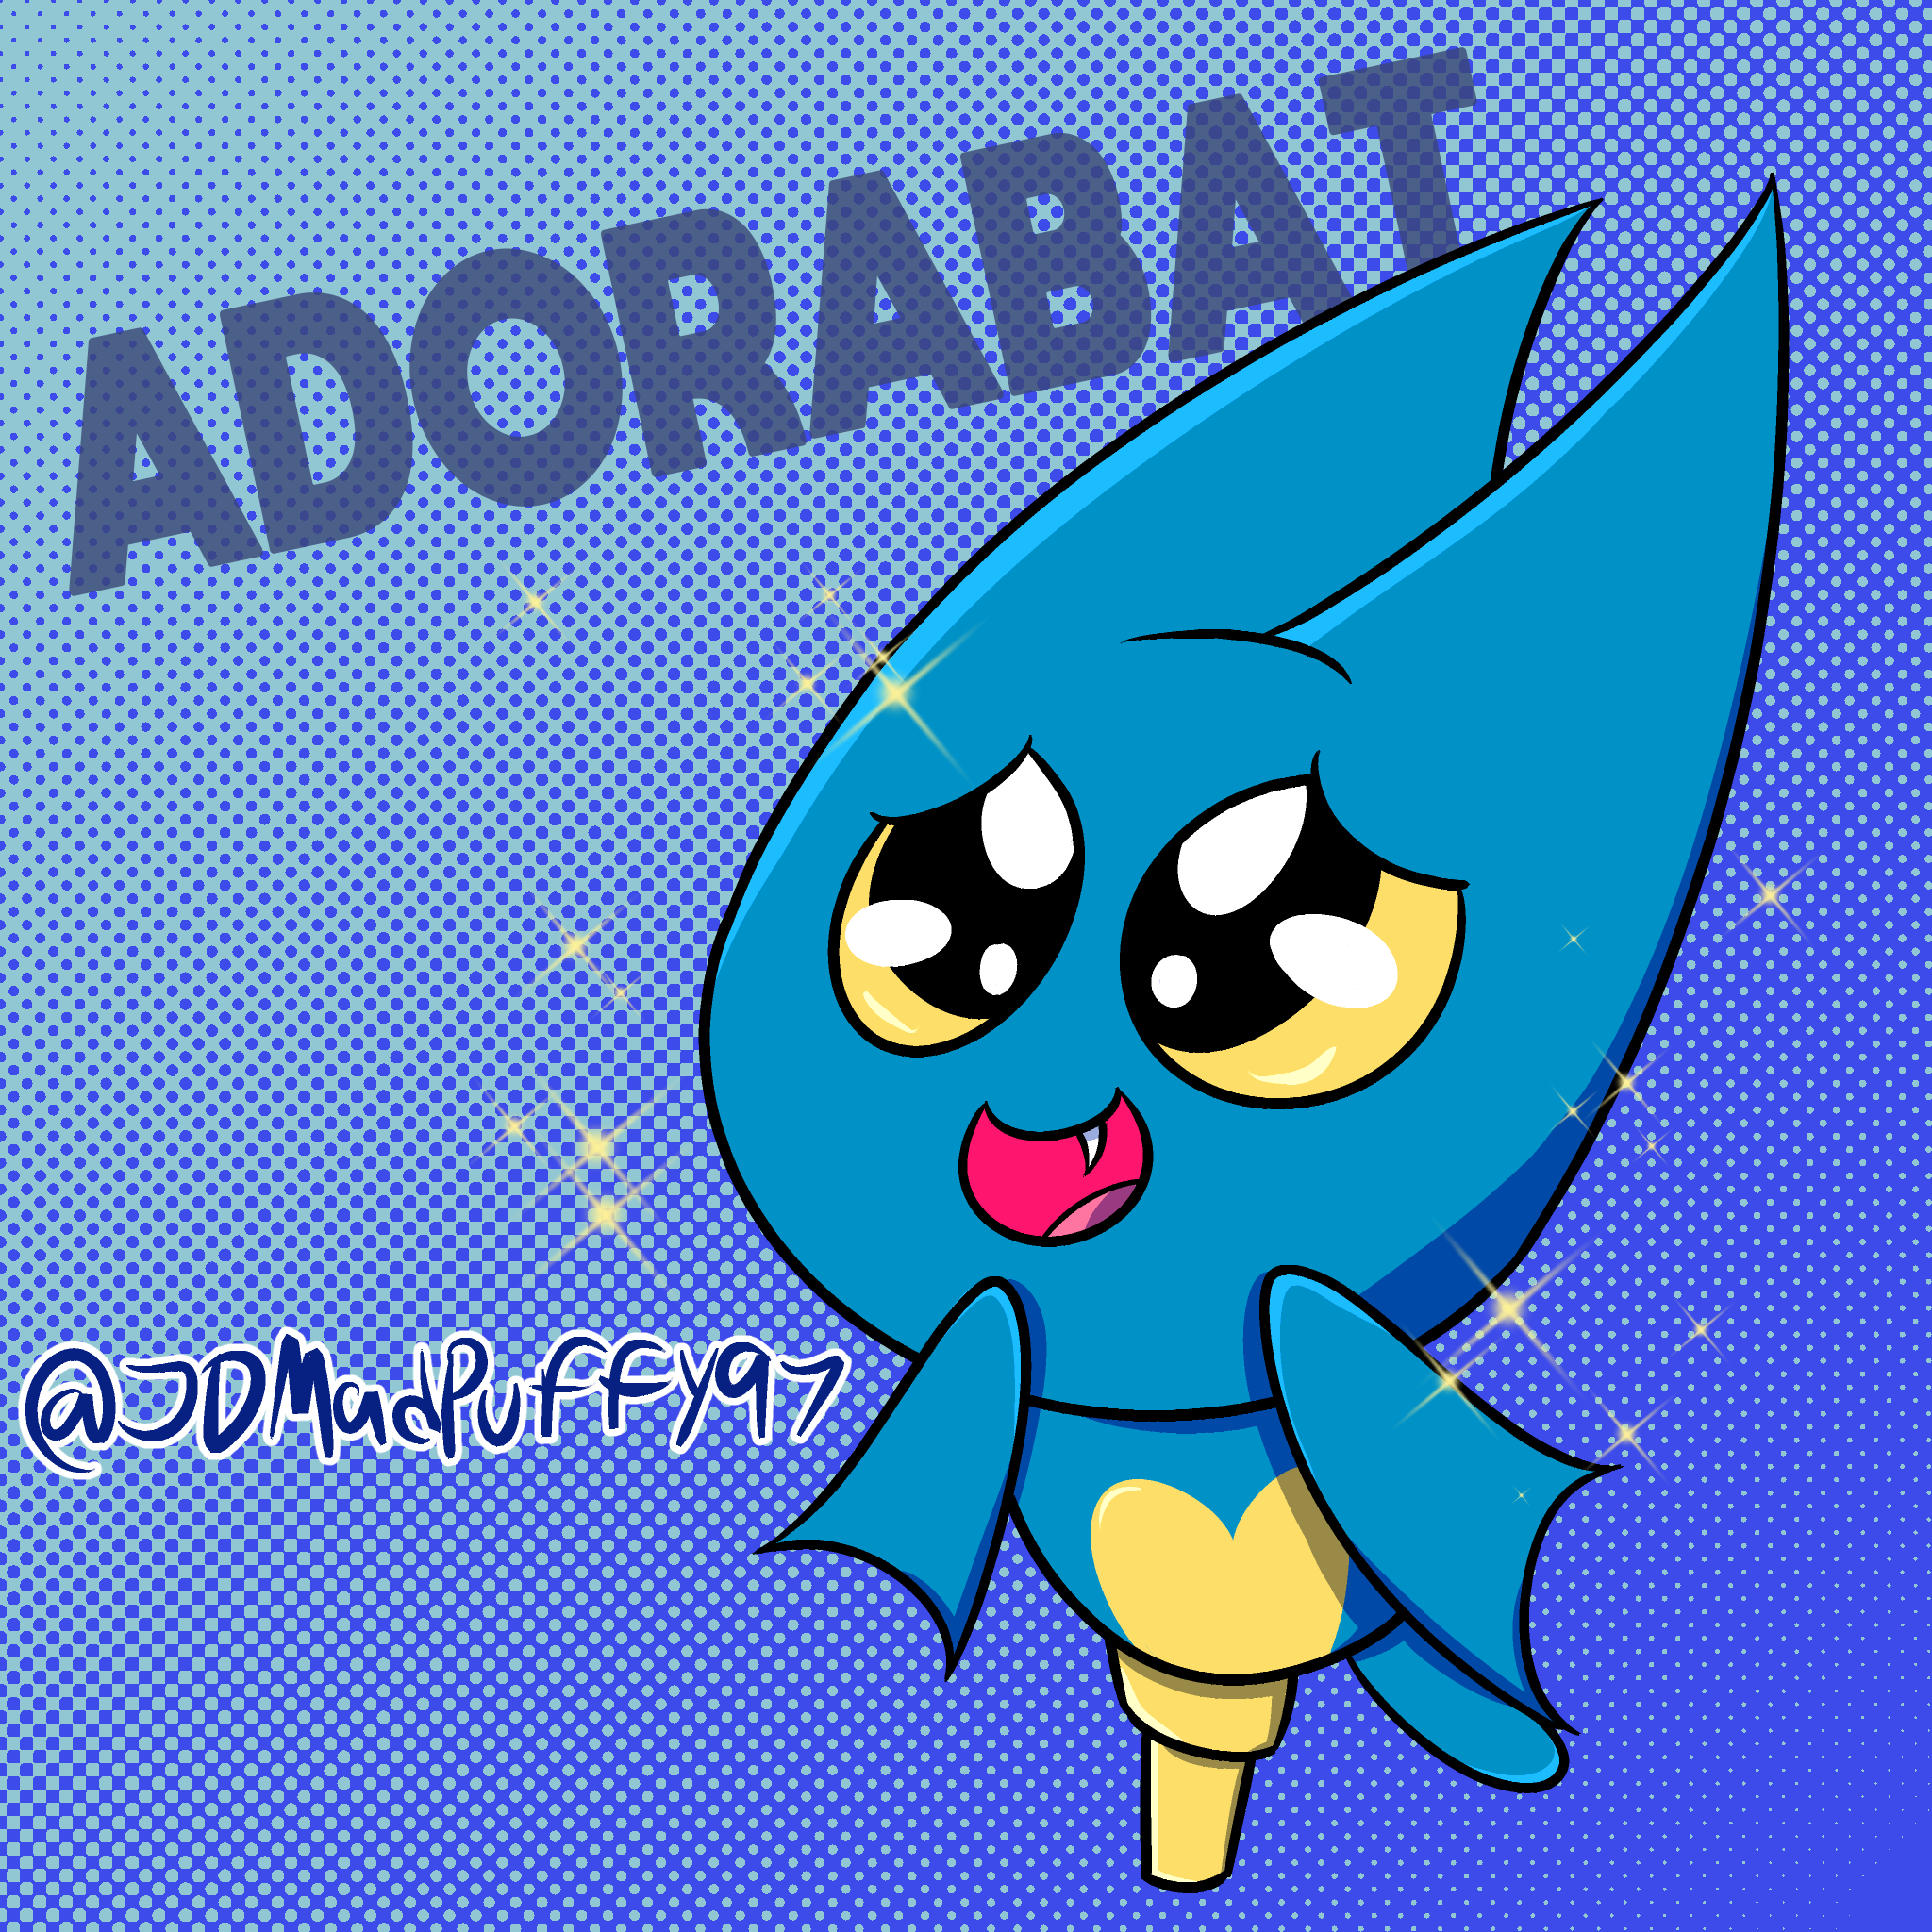 Jd Closed Commissions On Twitter Adorabat 3 Maomaoheroesofpureheart Adorabat Maomao Three dads & an adorabat + badgermao explosion (combined). twitter